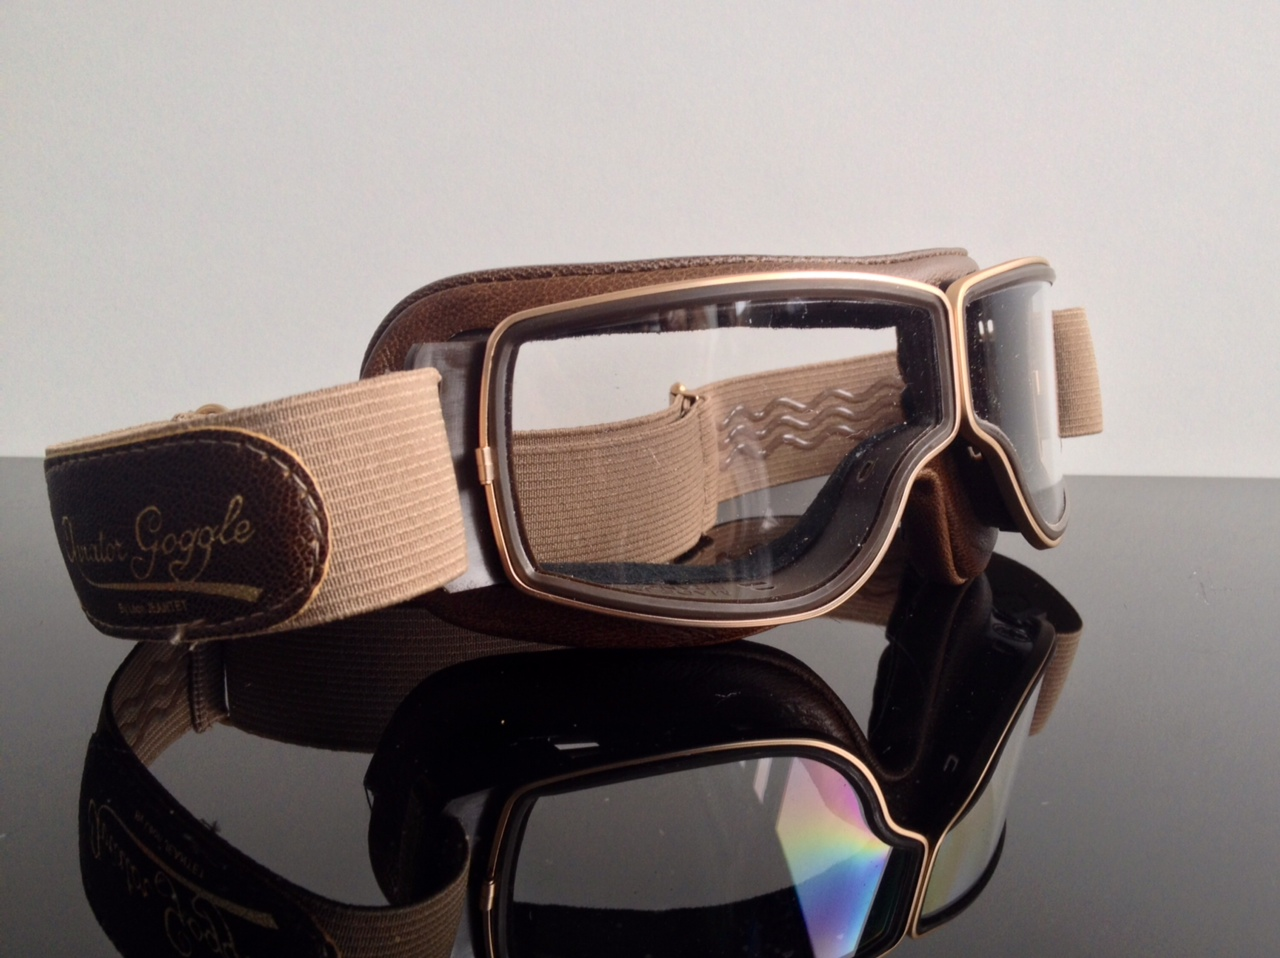 motorradbrille brille goggles lunettes luneta aviator. Black Bedroom Furniture Sets. Home Design Ideas